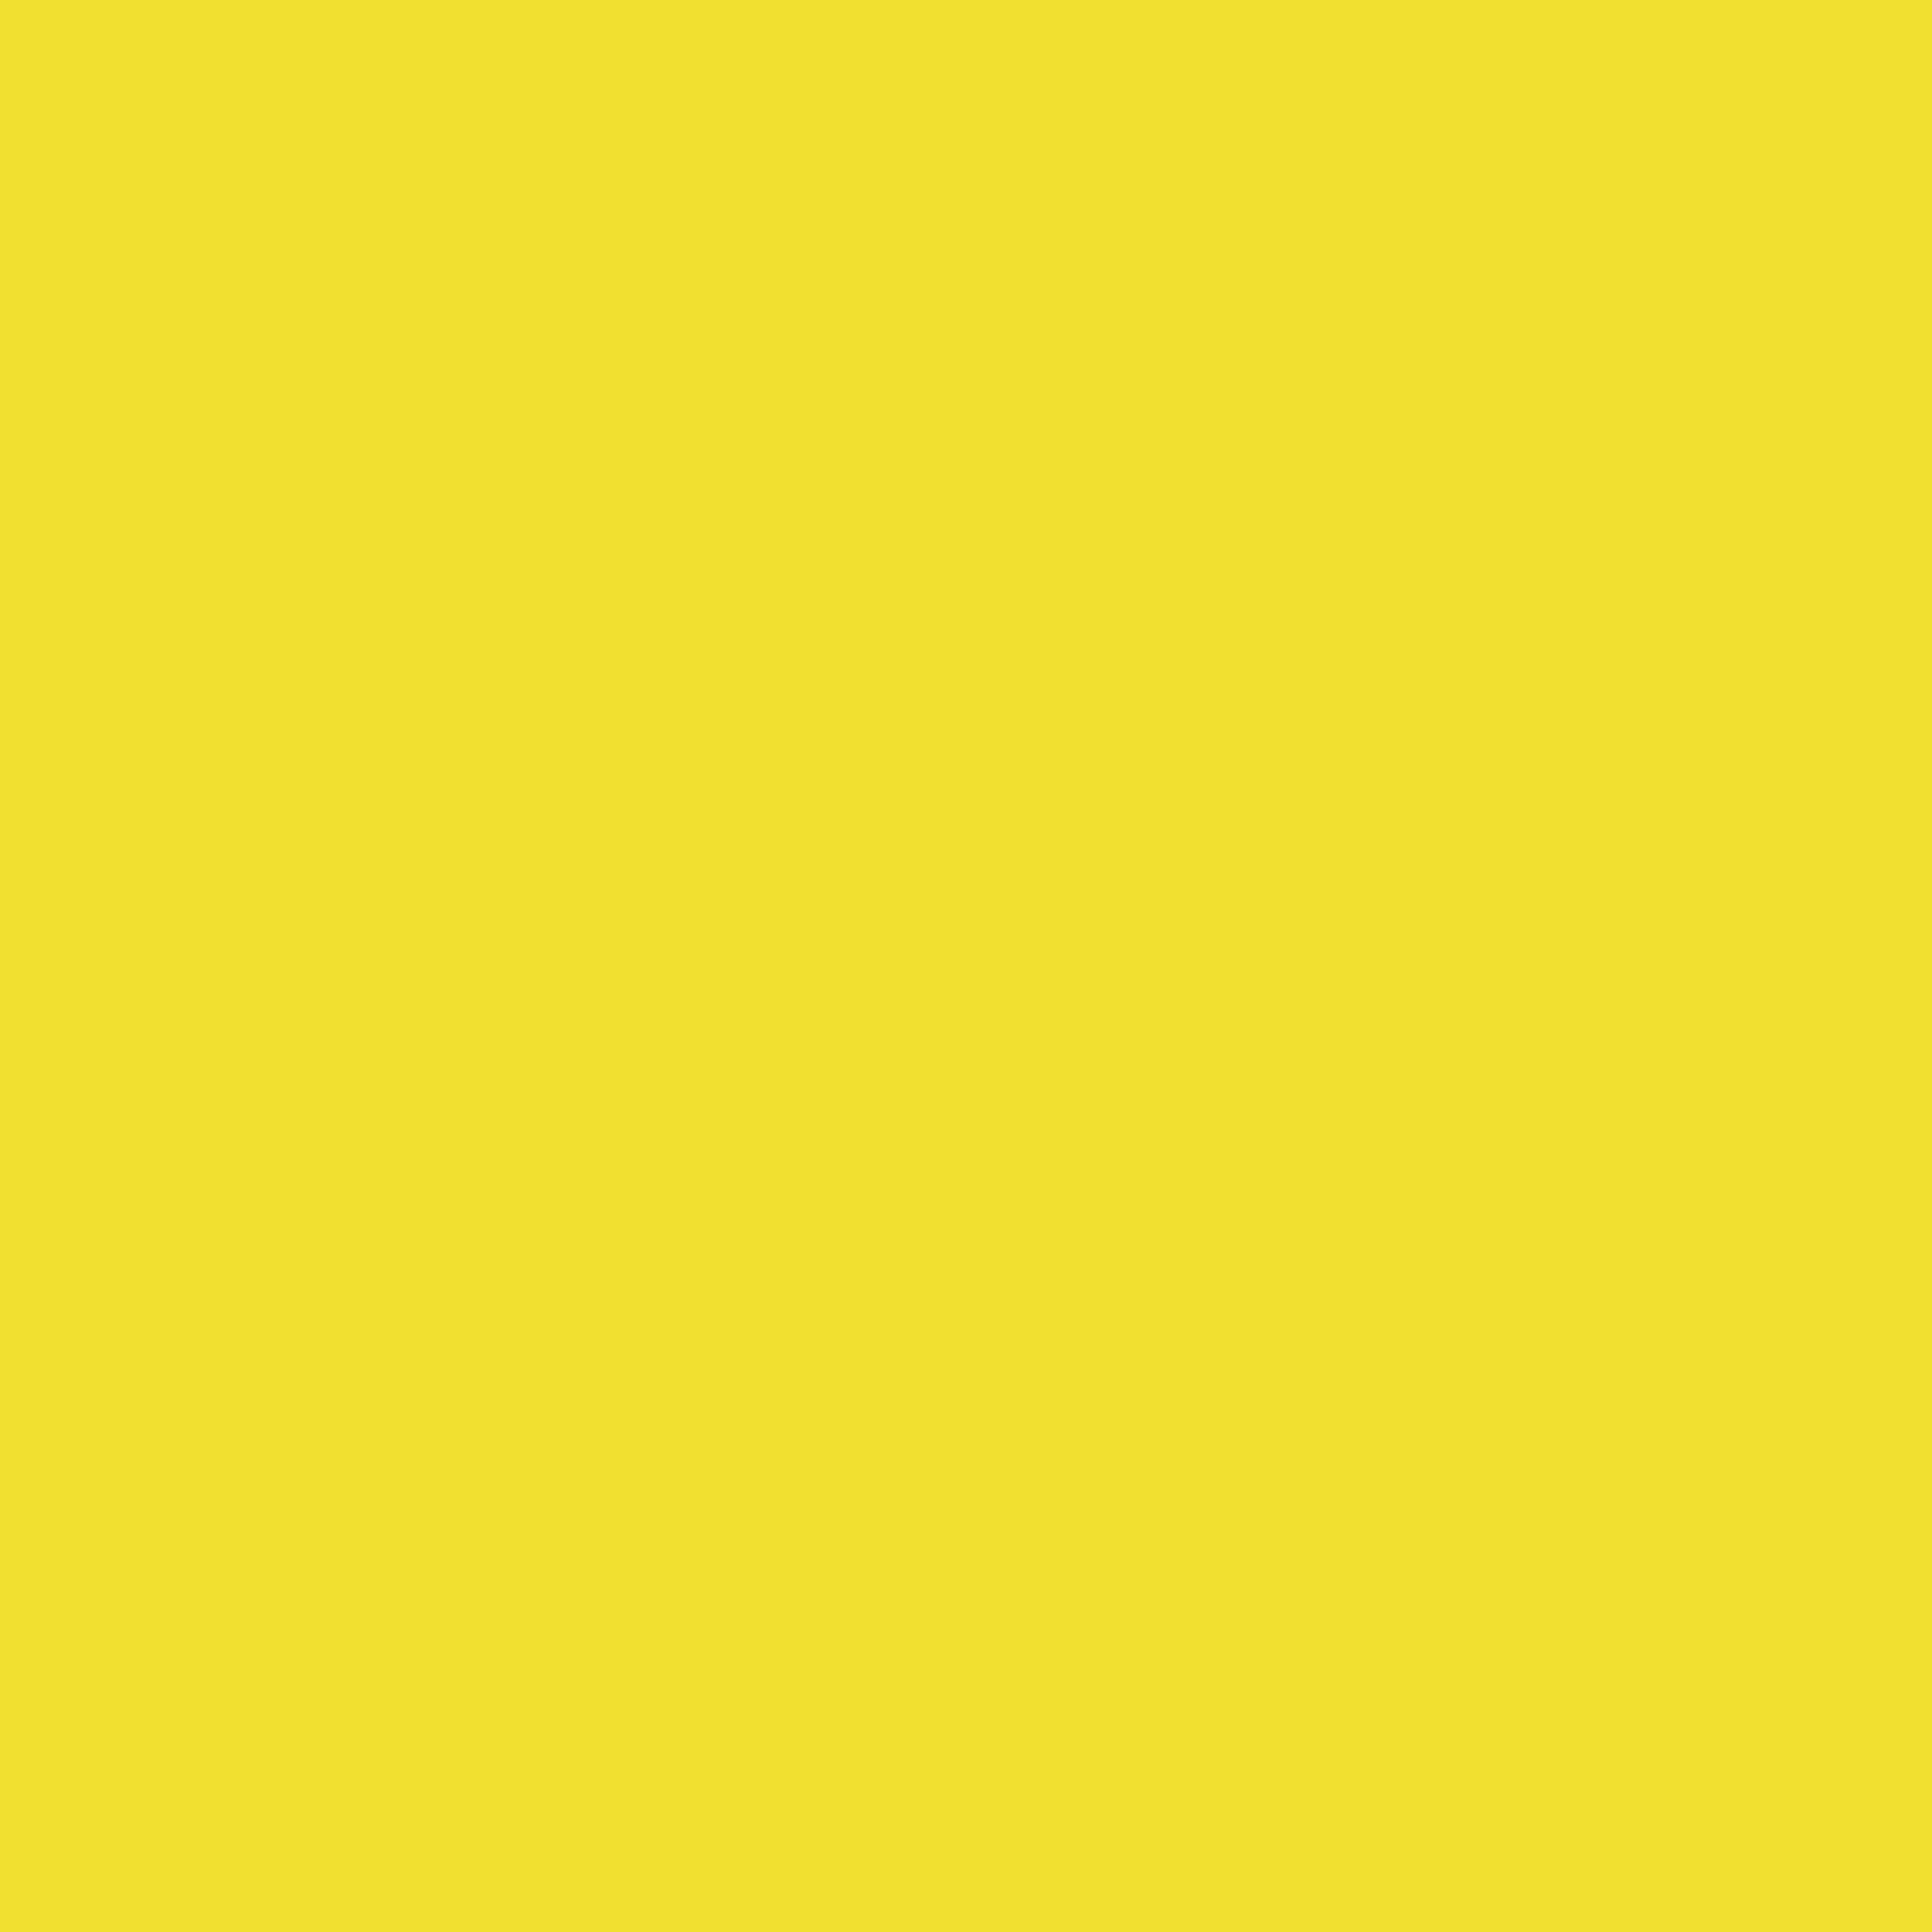 3600x3600 Dandelion Solid Color Background